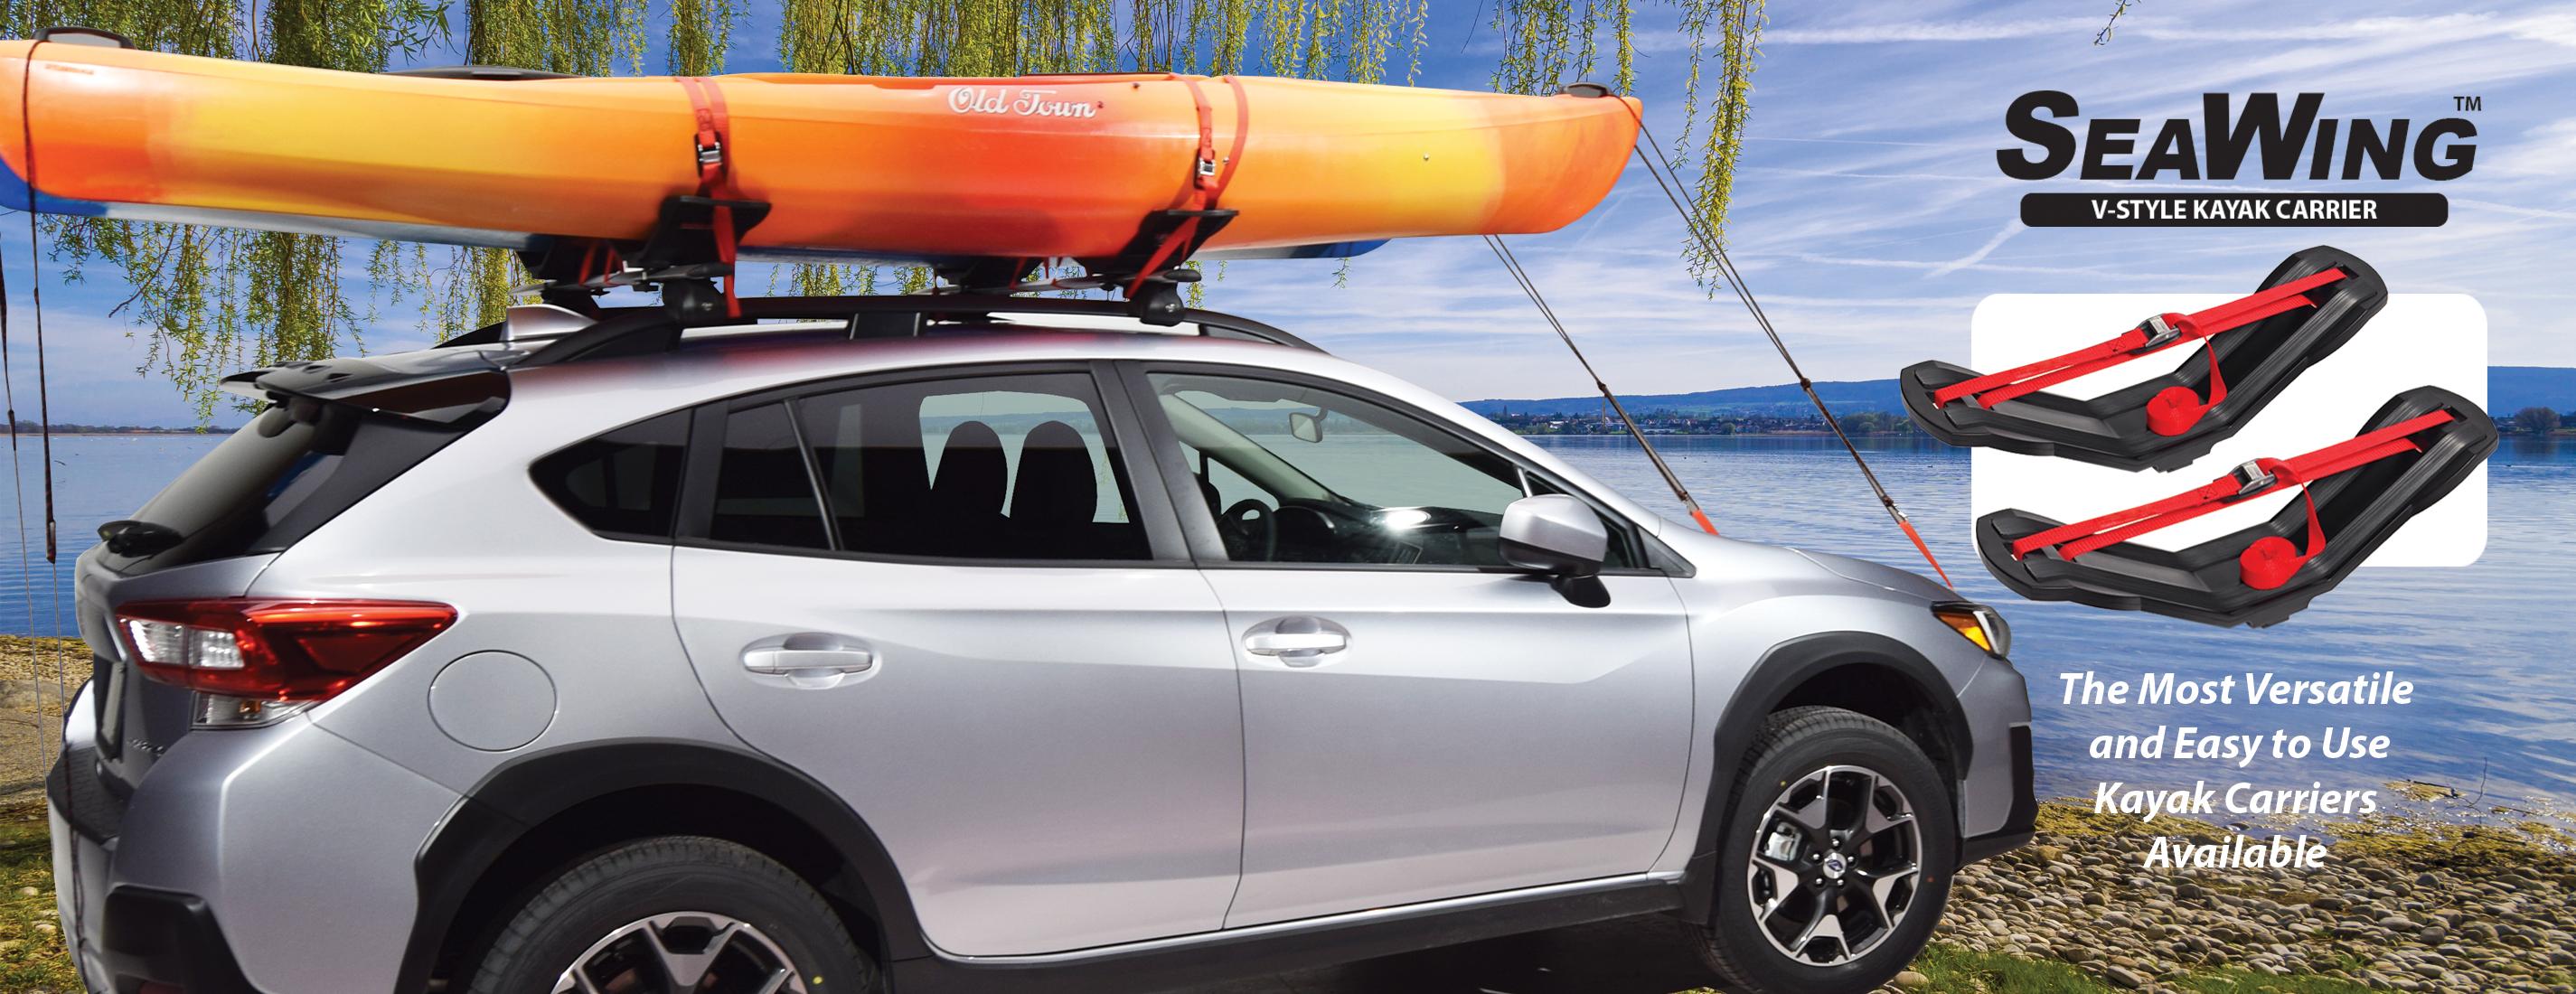 youtube car kayak revolution watch roof onto loading the rack hobie